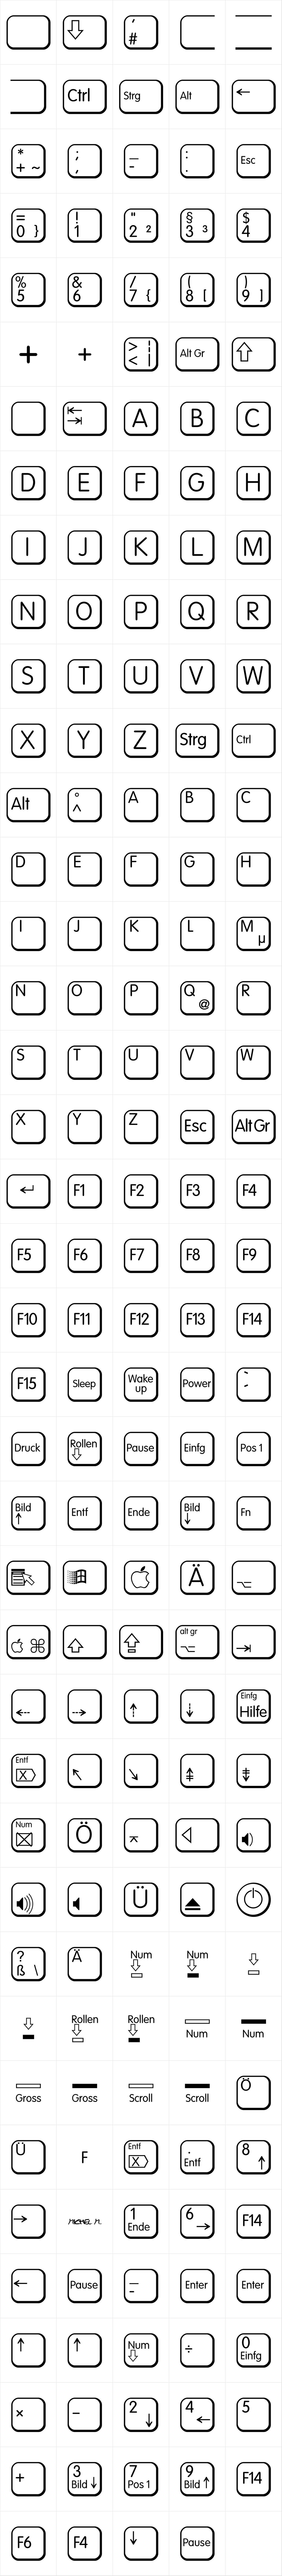 Keys D